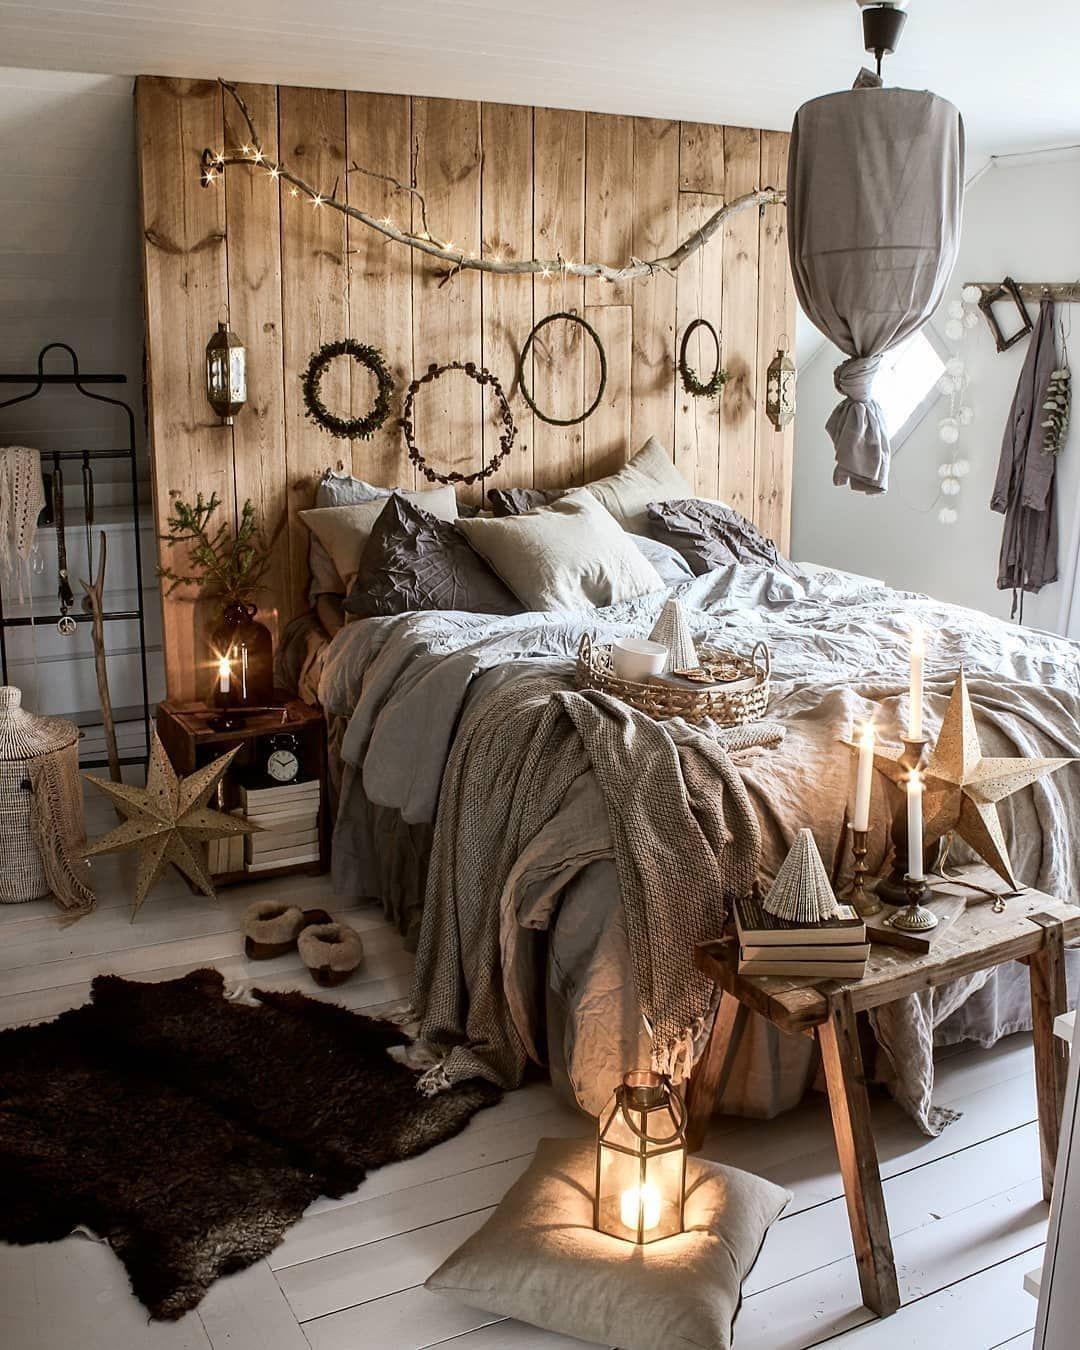 Bohogang On Instagram So Rustic And Beautiful Via Bytrineravn Bohemian Bohemiande Boho Bedroom Decor Hippie Boho Bedroom Decor Home Decor Bedroom